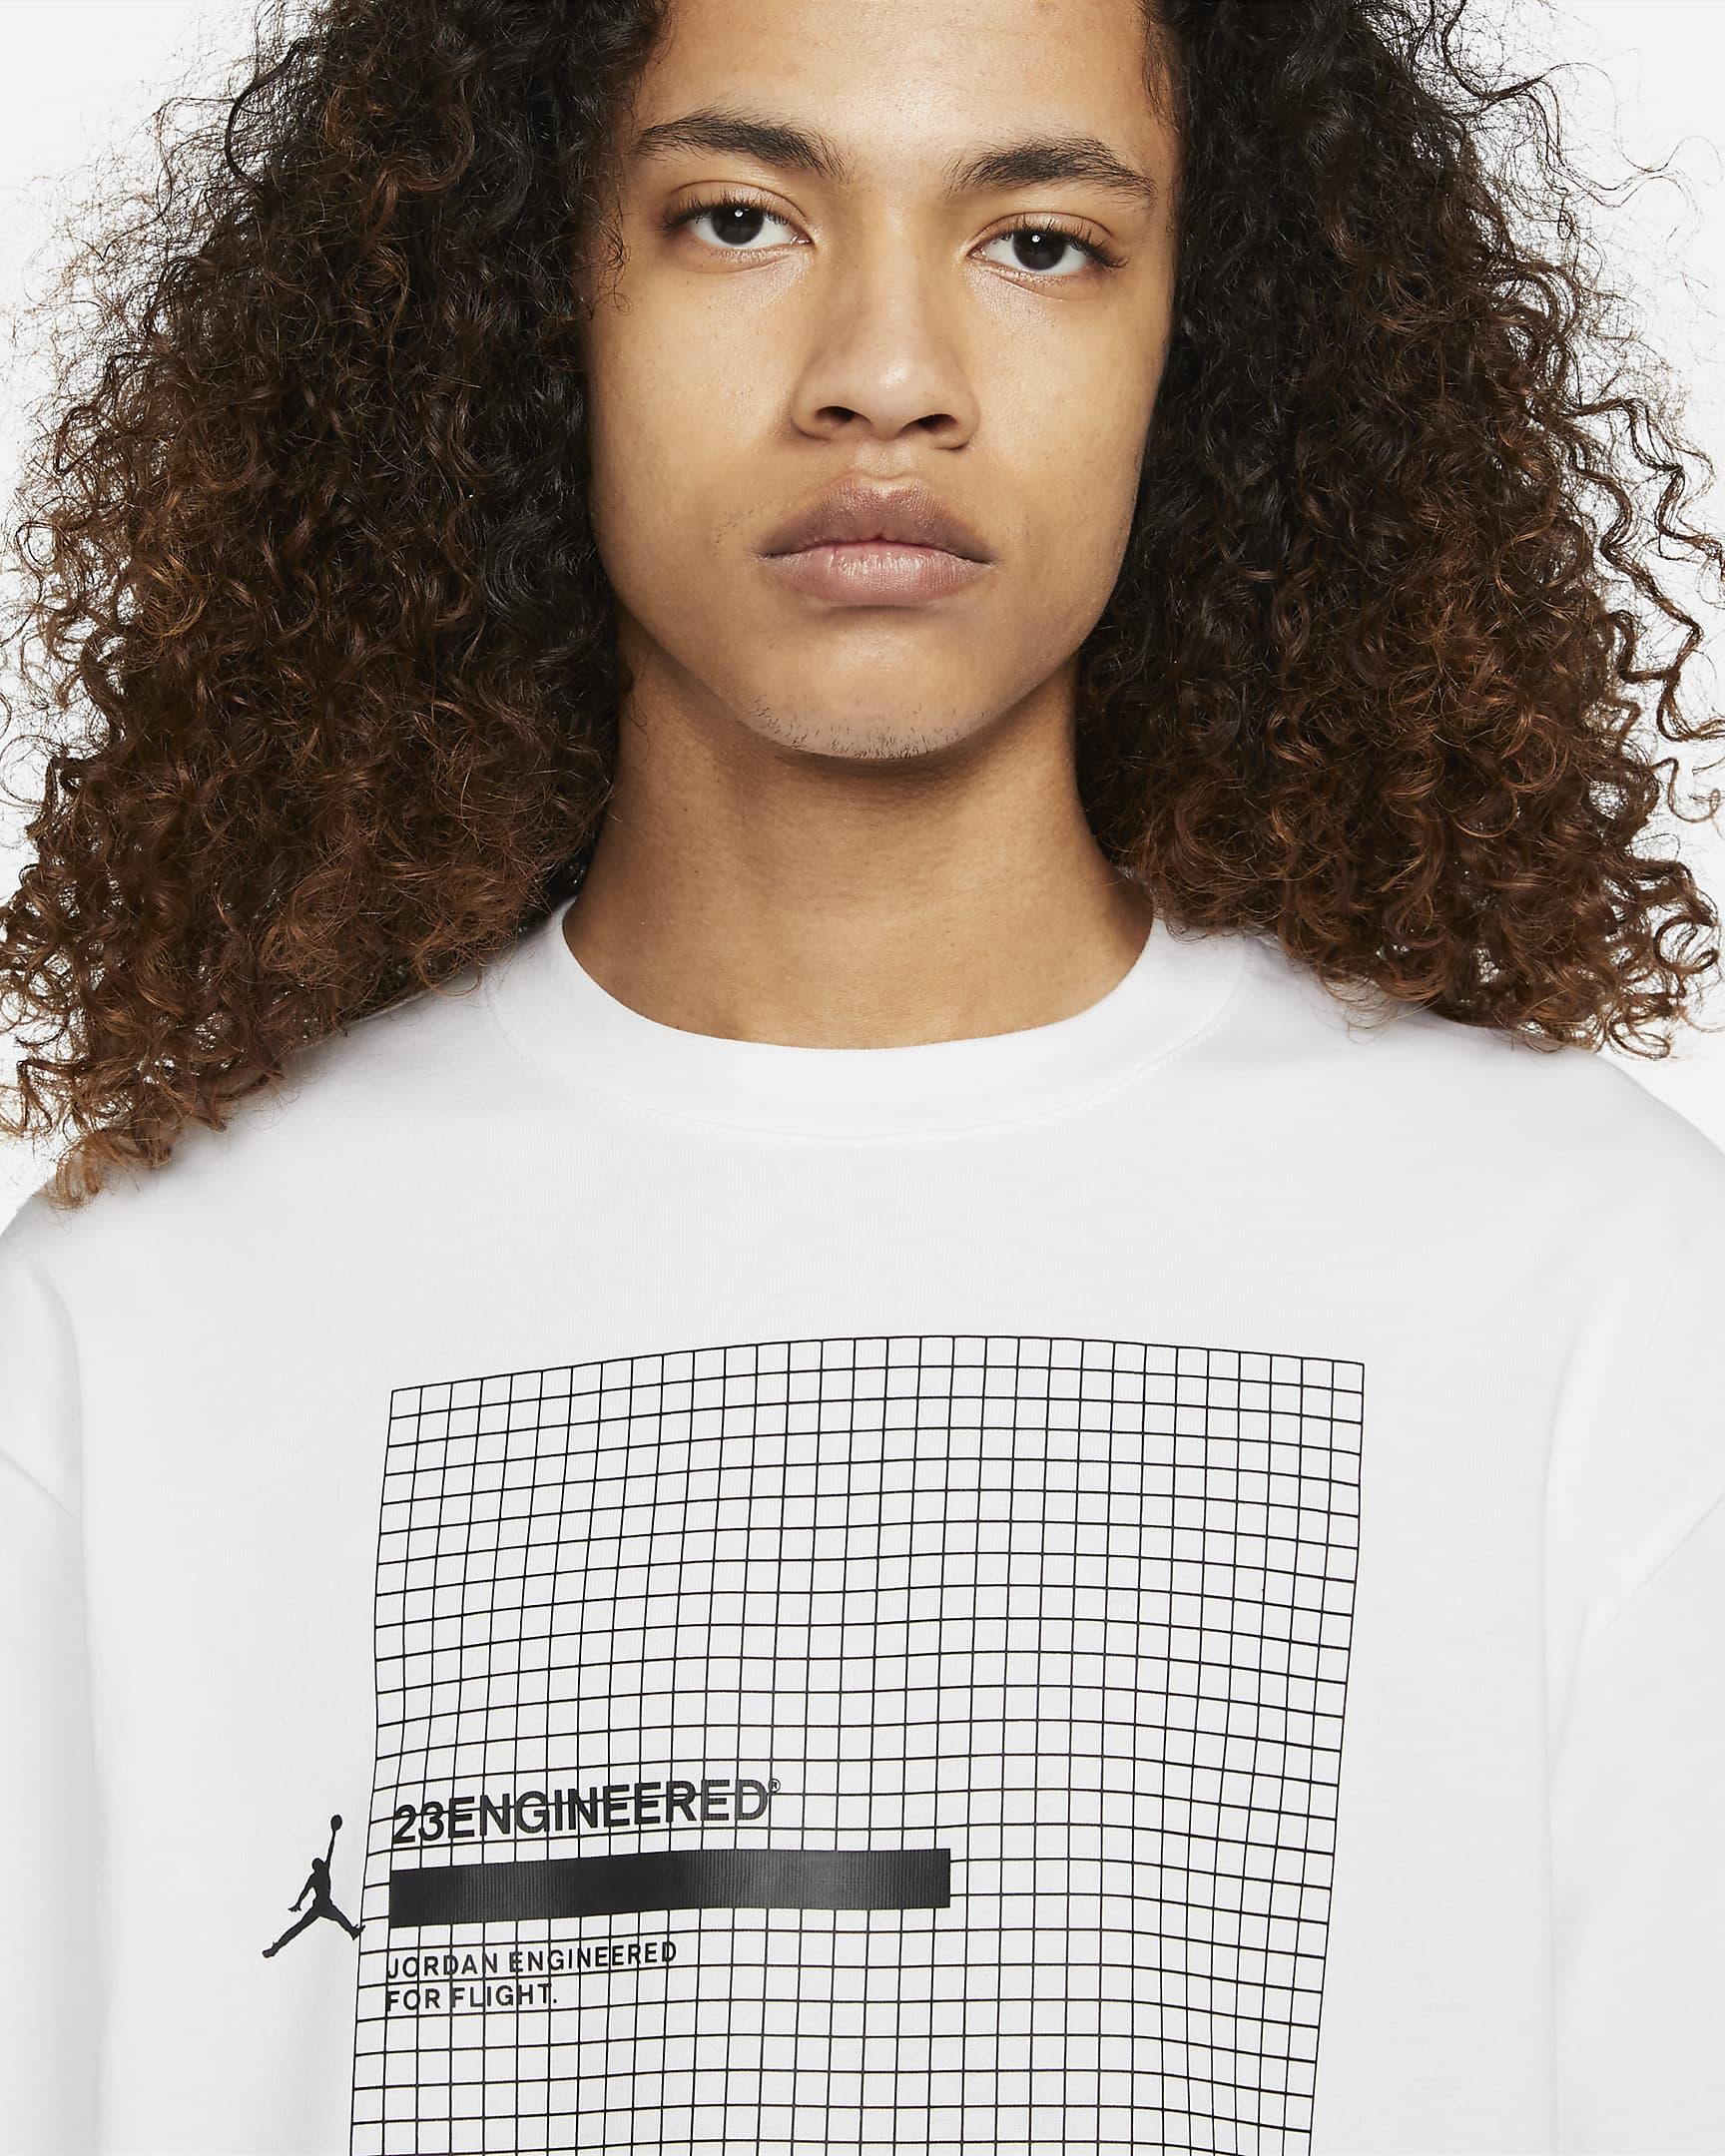 jordan-23-engineered-mens-short-sleeve-t-shirt-WwjbT9-3.png